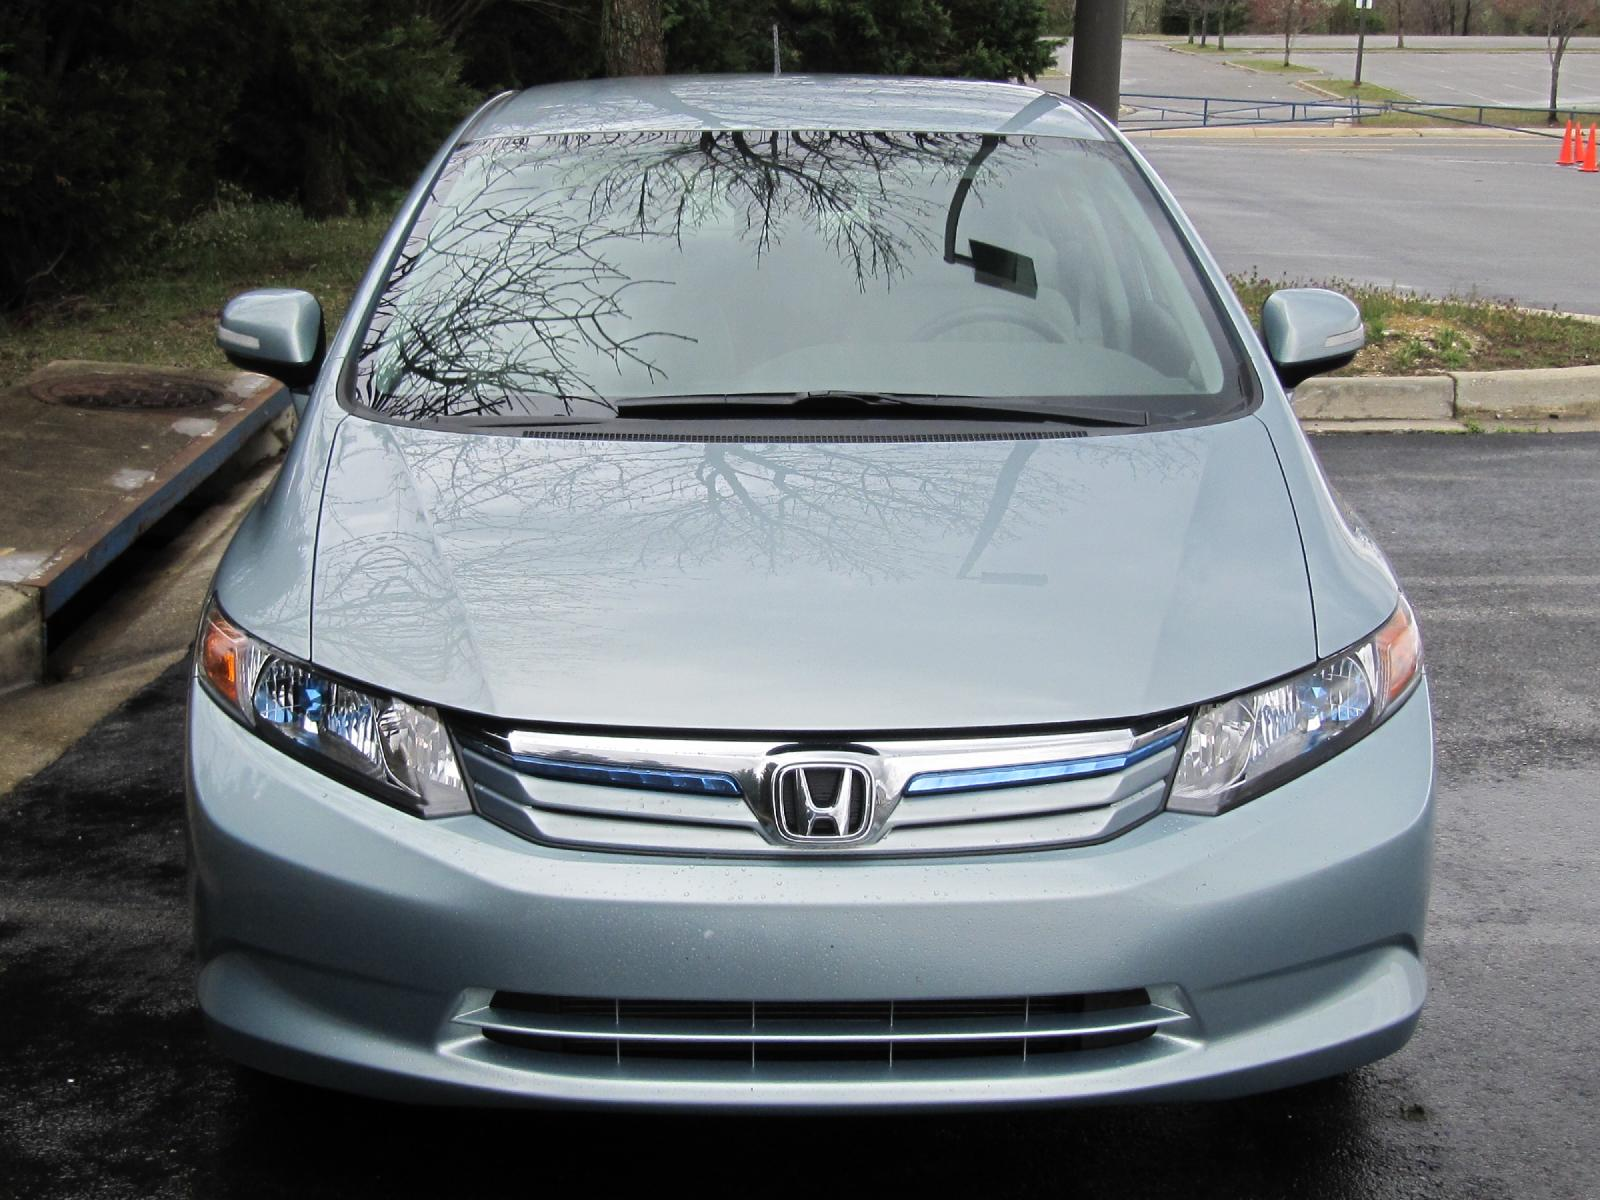 2013 honda civic hybrid will be made in u s not japan for Where are honda civics made